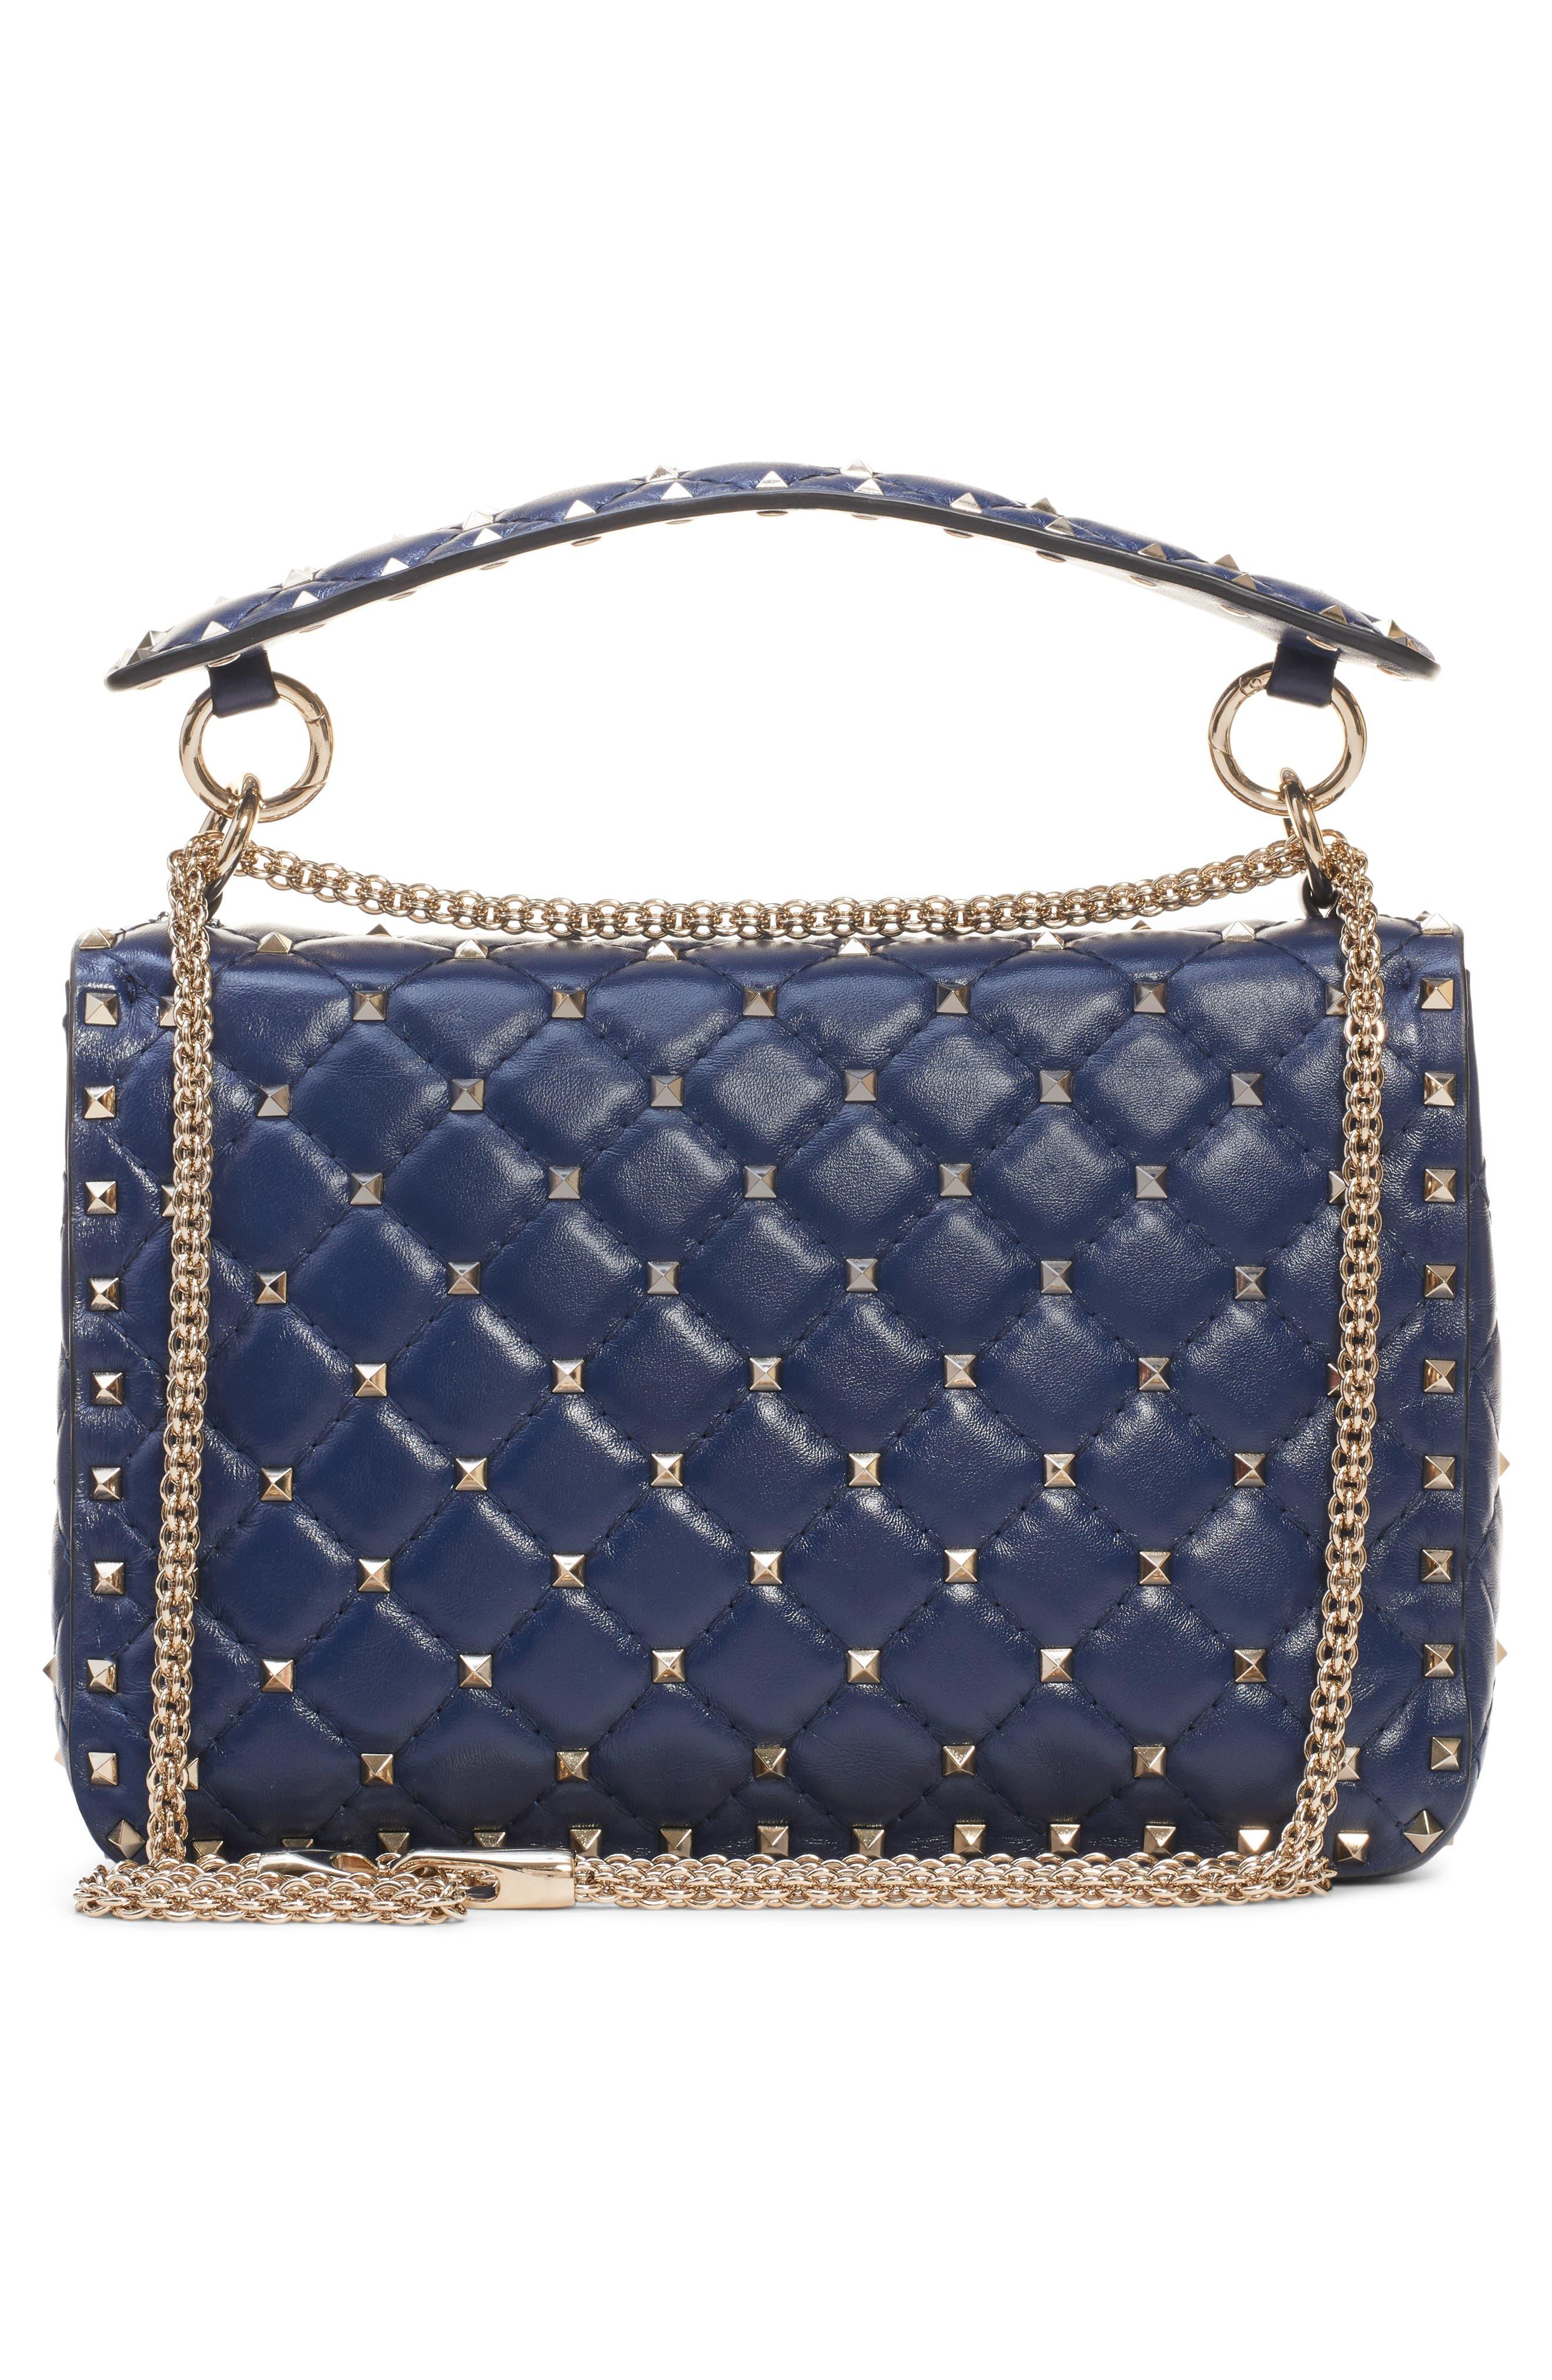 Medium Spike.It VLTN Logo Leather Shoulder Bag,                             Alternate thumbnail 3, color,                             PURE BLUE/ BIANCO OTTICO